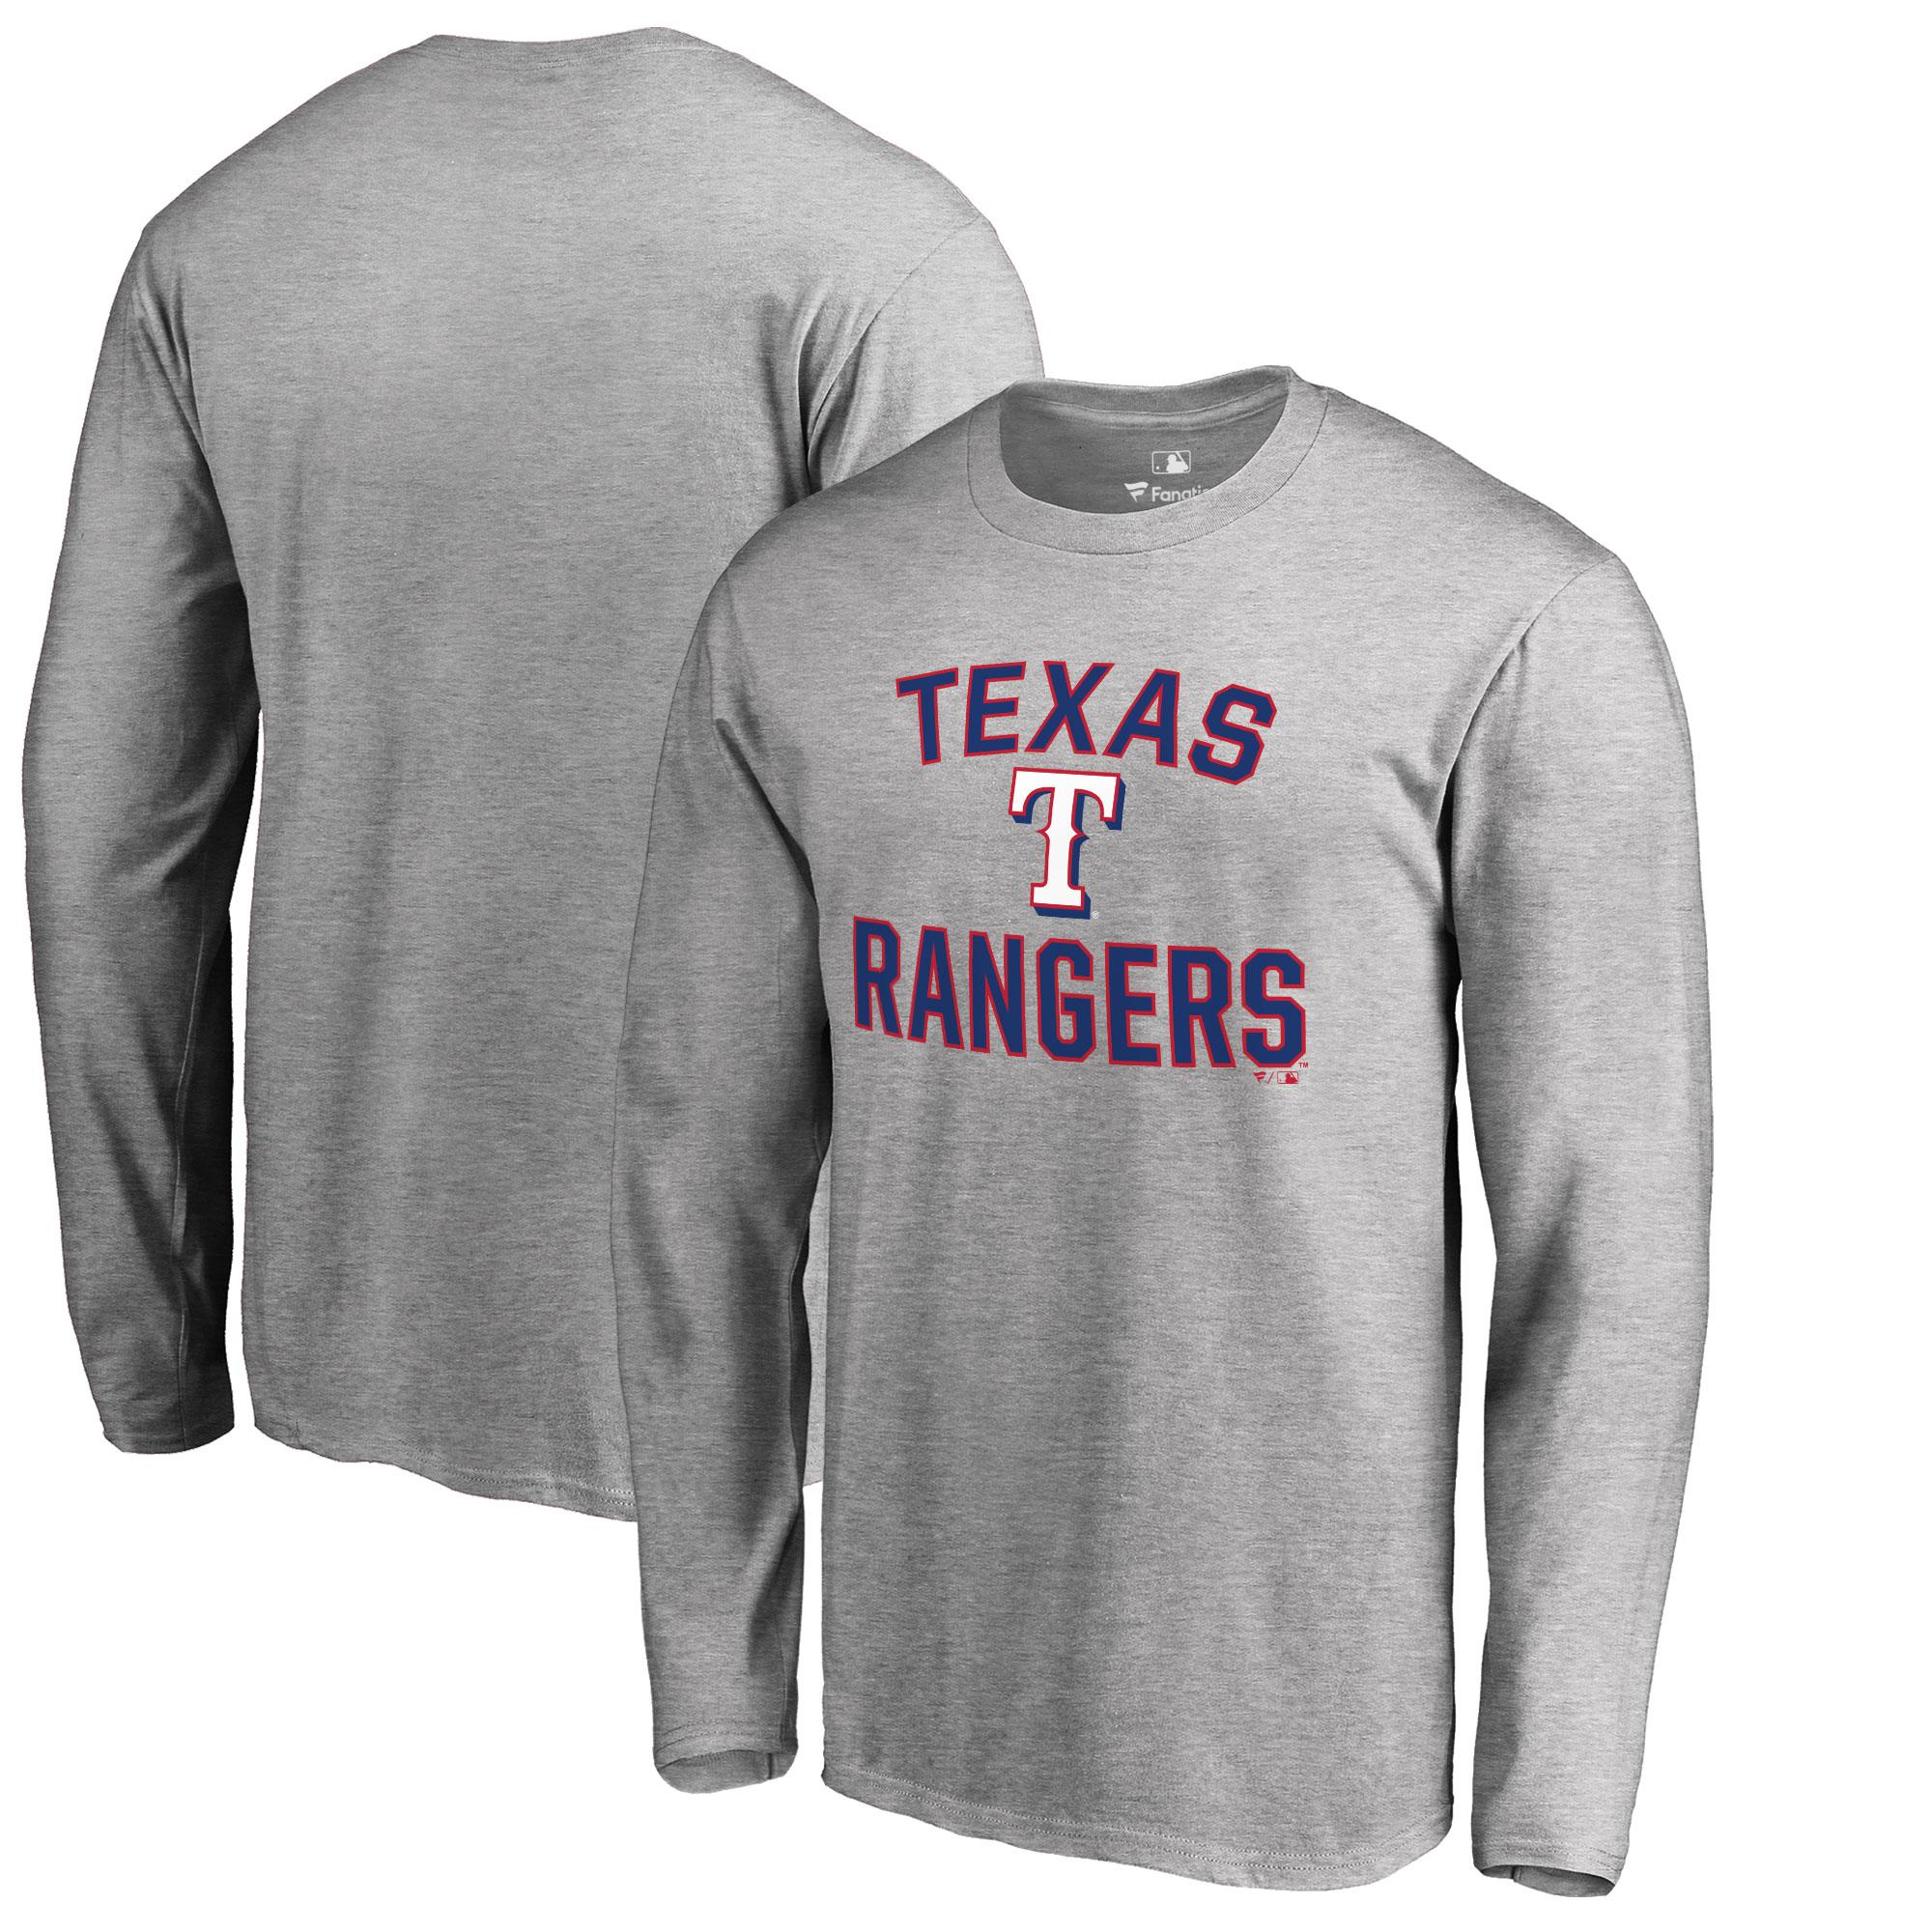 Texas Rangers Big & Tall Victory Arch Long Sleeve T-Shirt - Ash